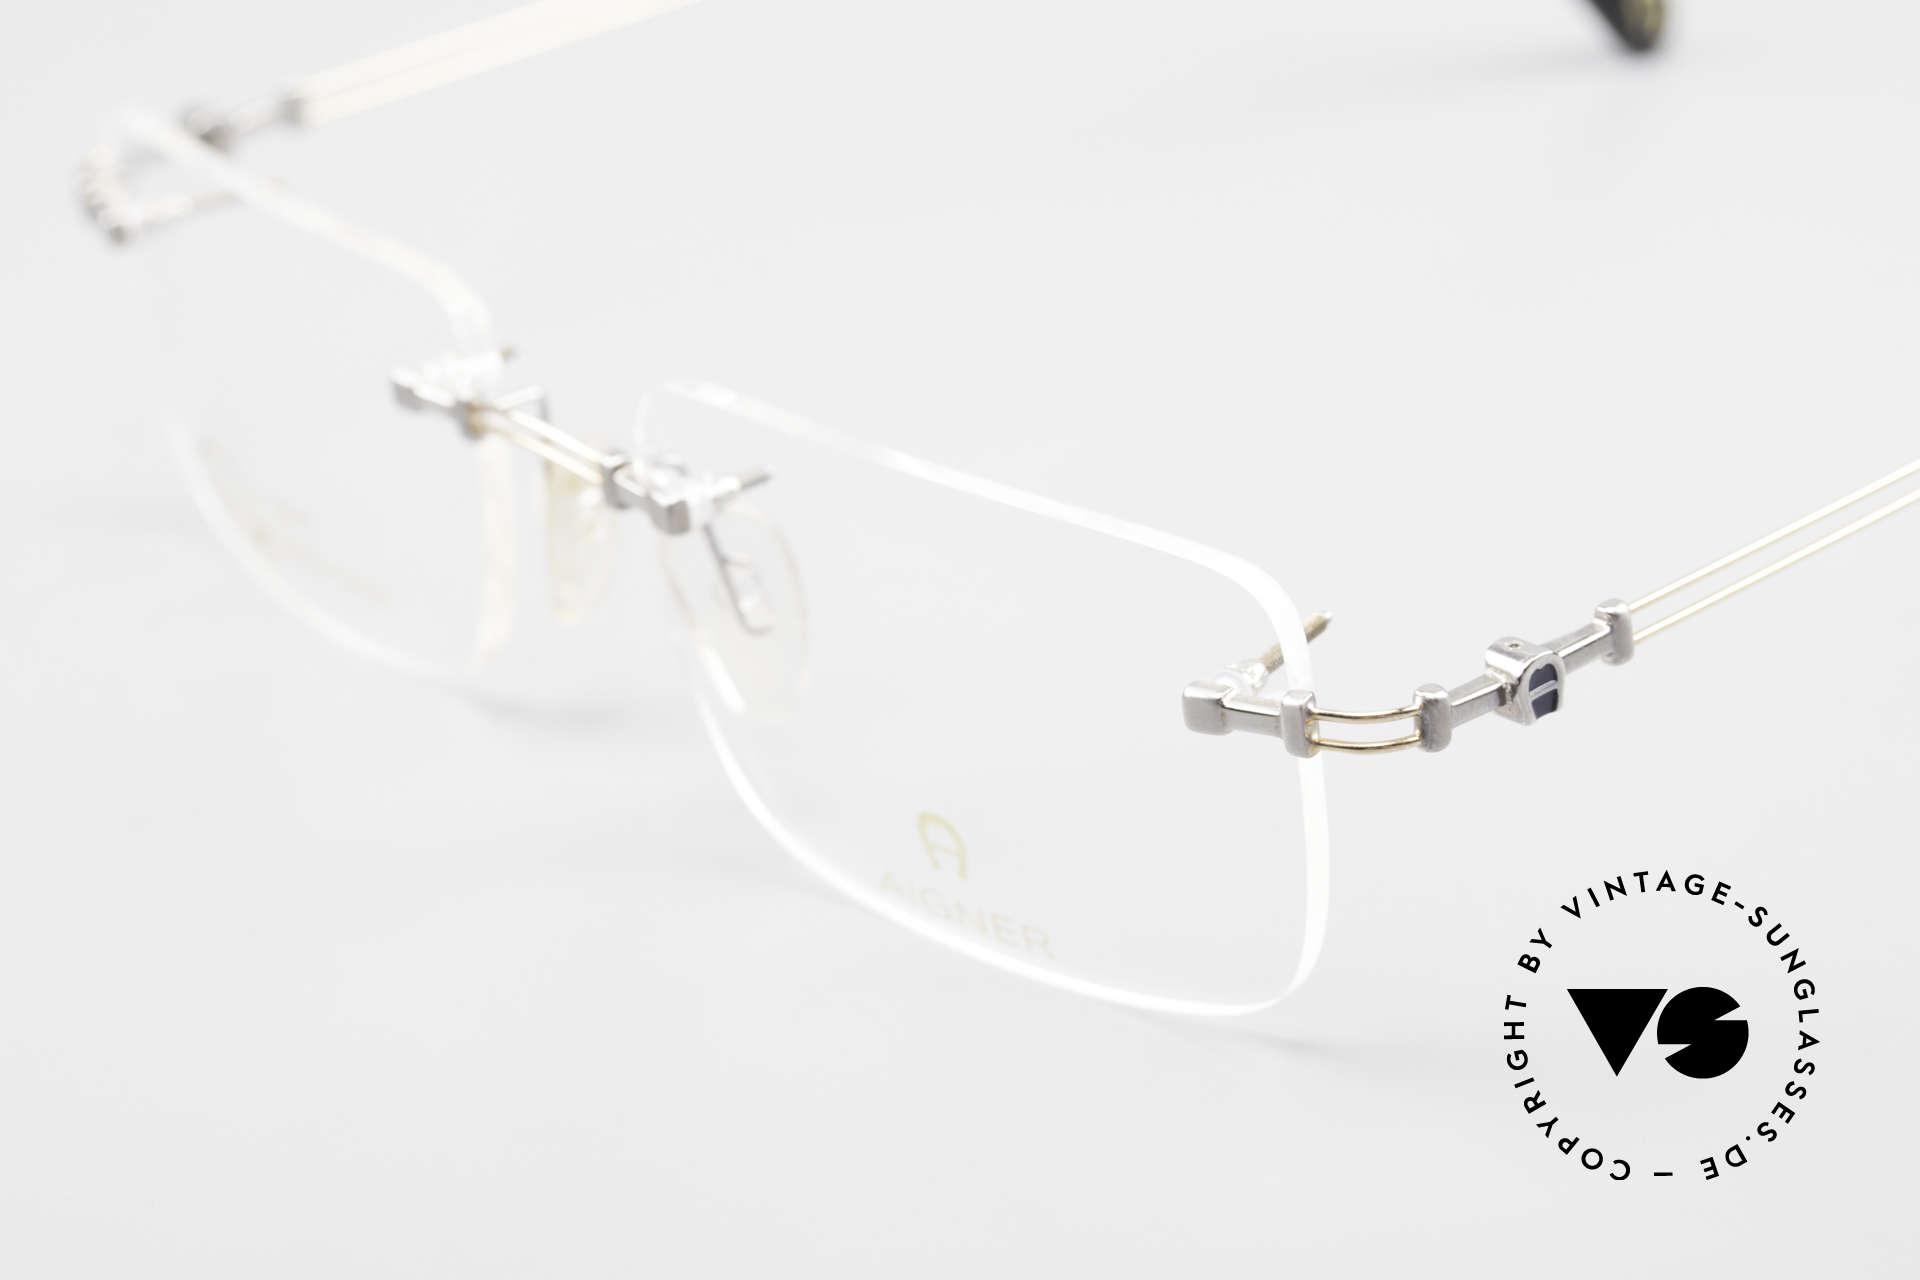 Aigner EA496 Rimless 90's Vintage Glasses, never worn, NOS (like all our rare 90's Aigner eyeglasses), Made for Men